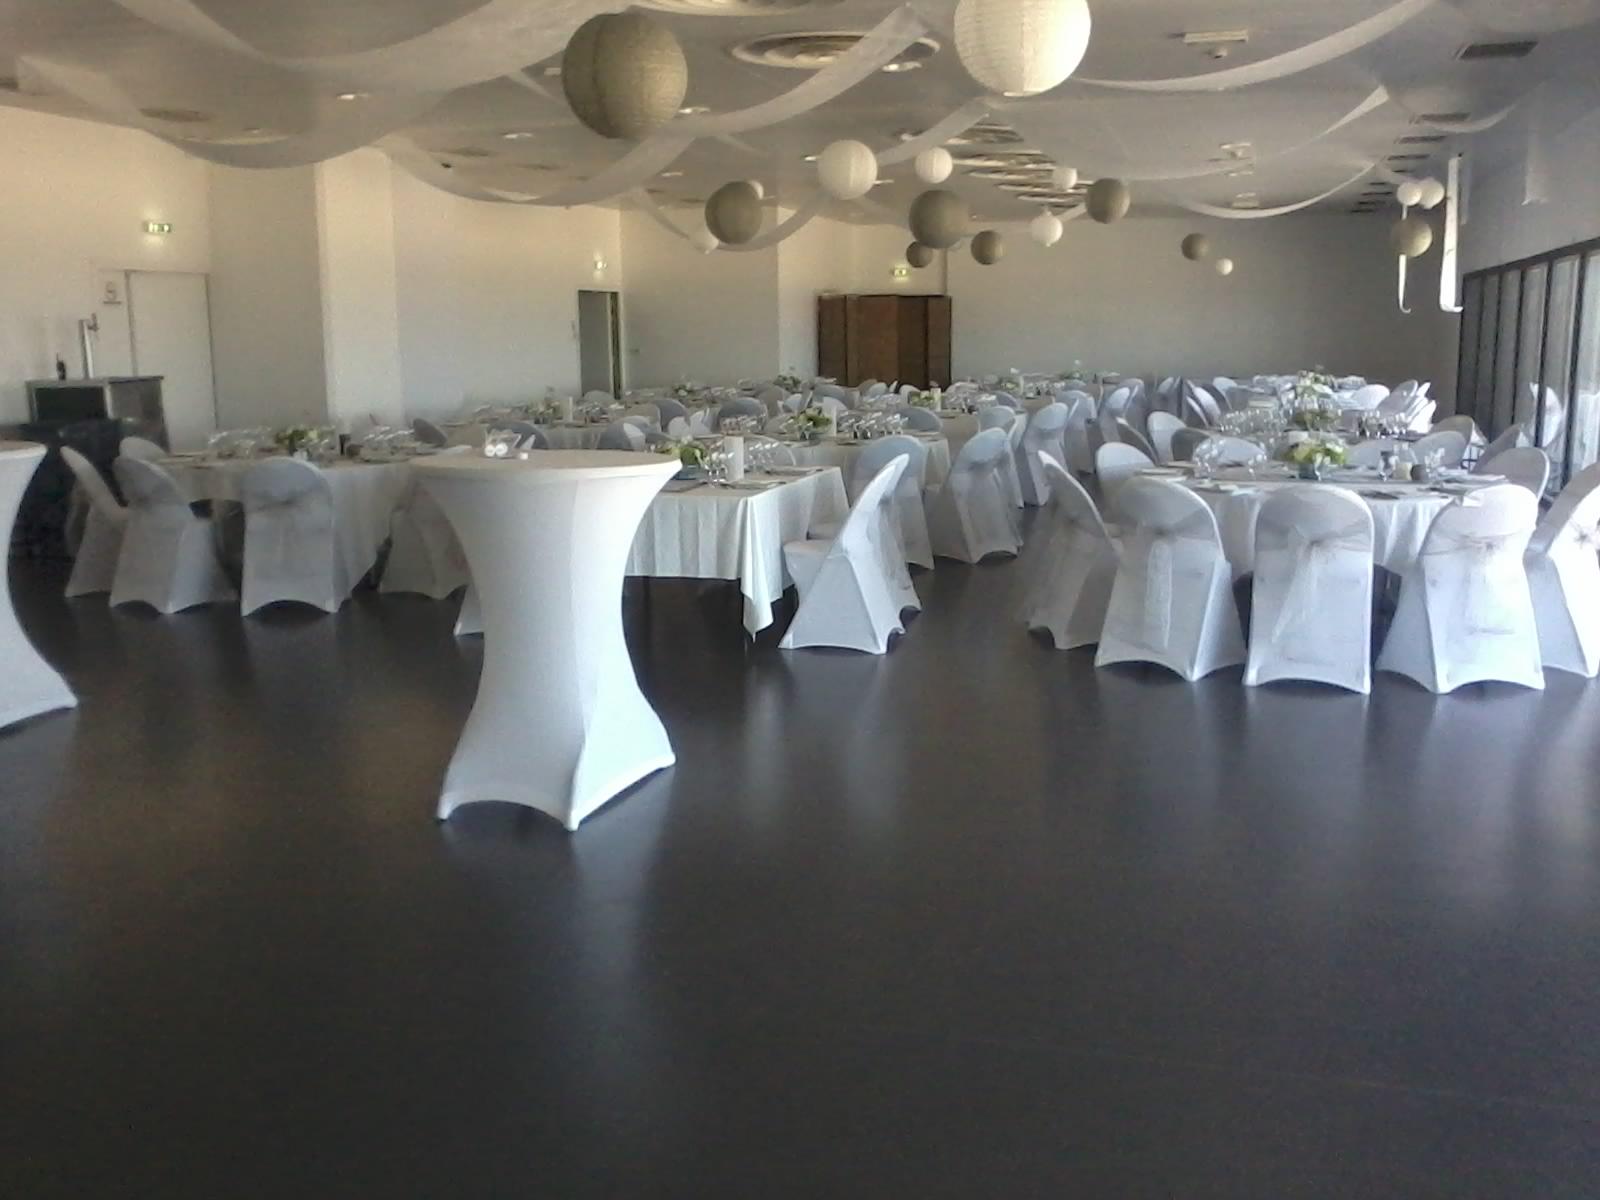 Kursaal de Dunkerque